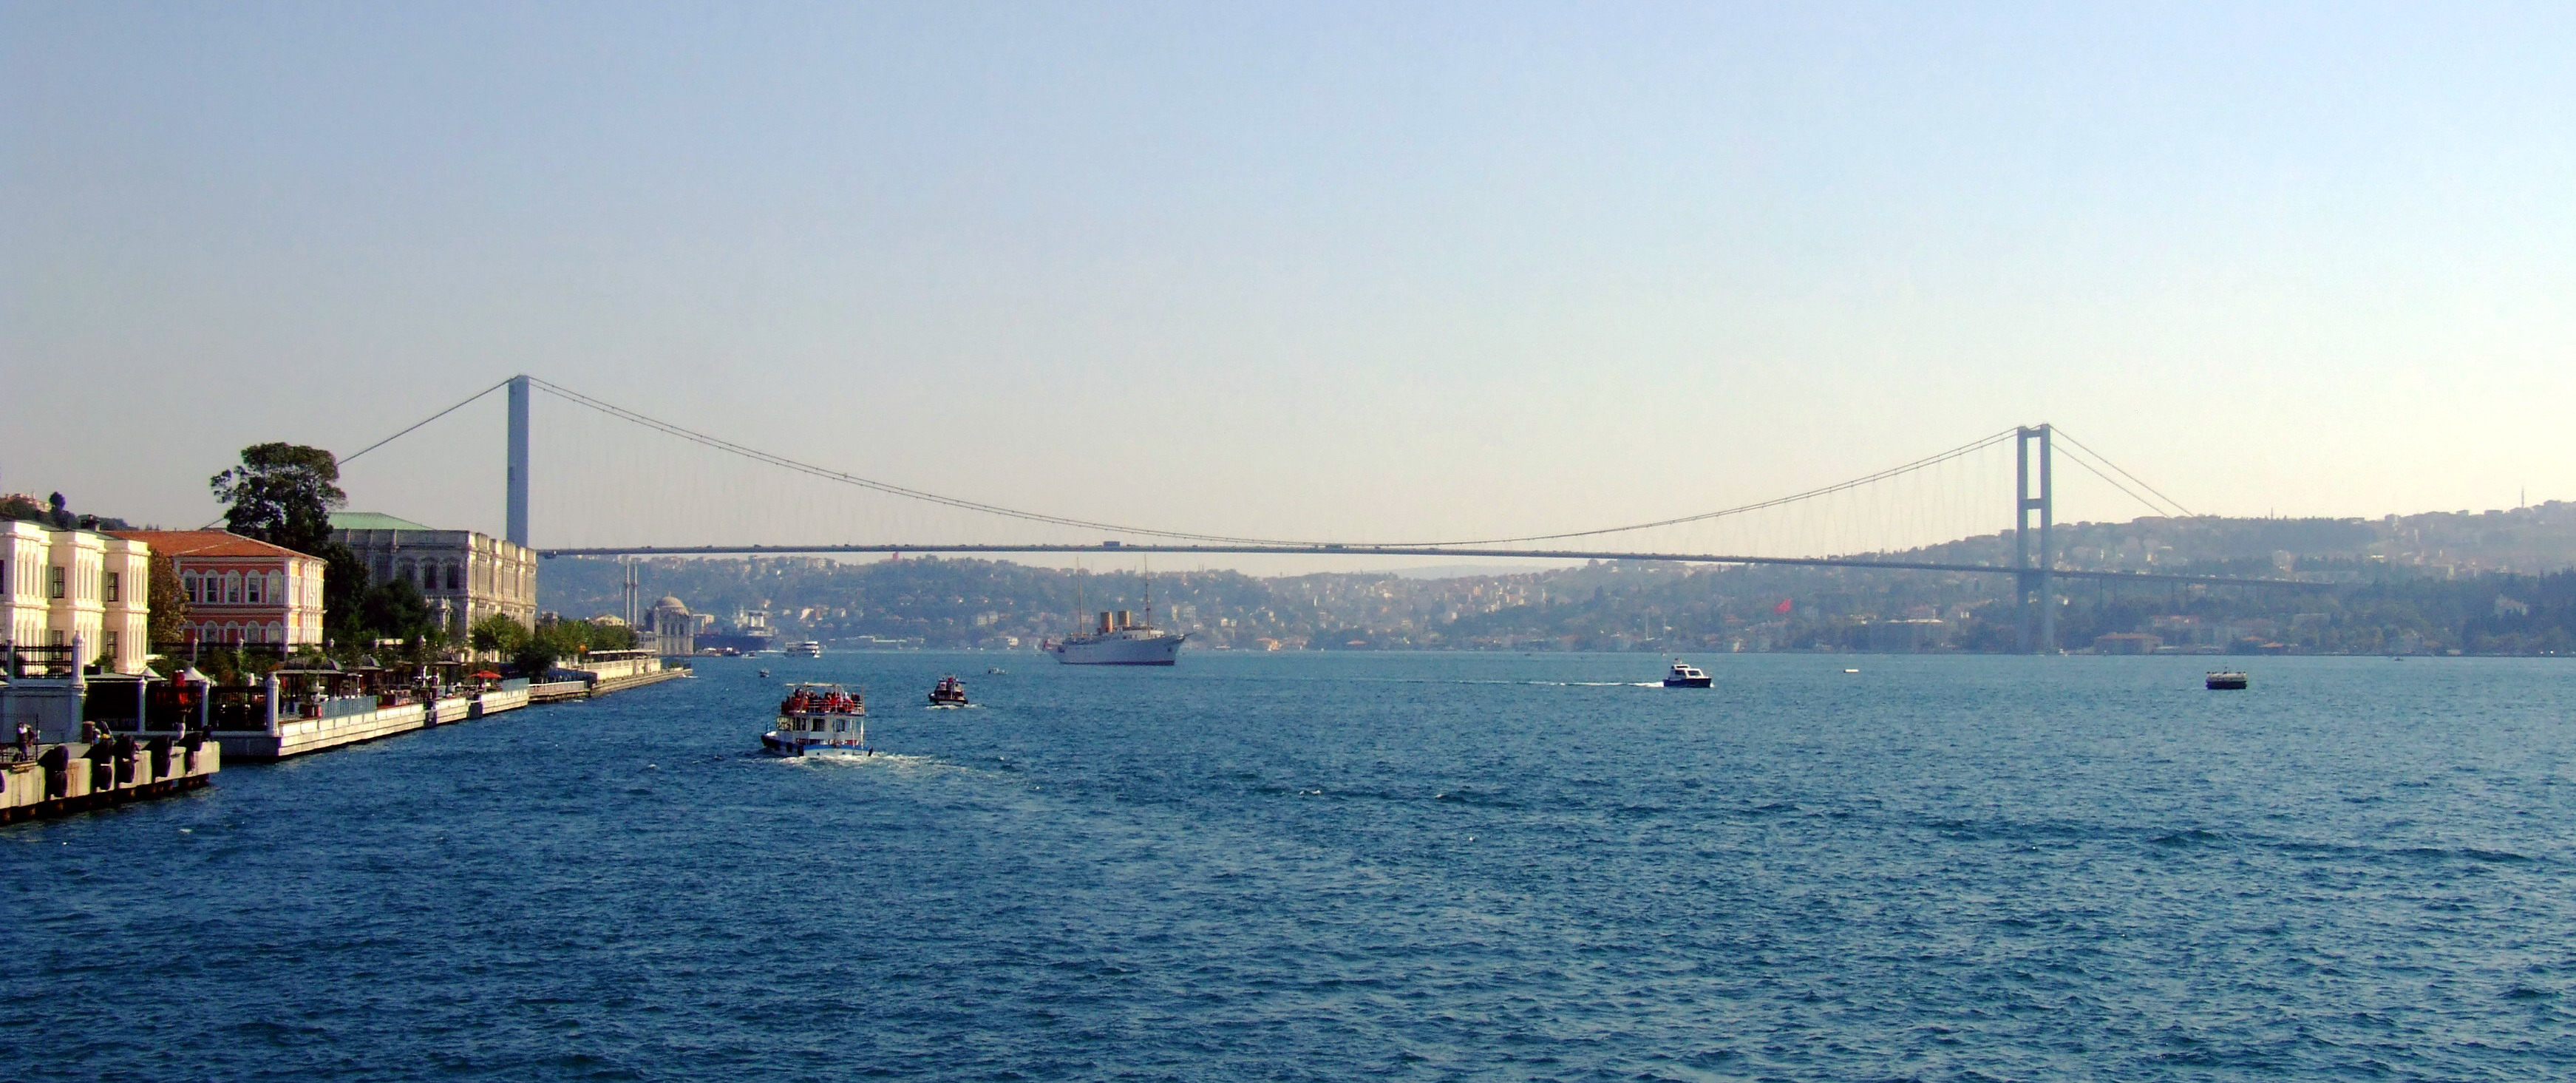 Turkey's security pivot towards Russia runs deeper than we